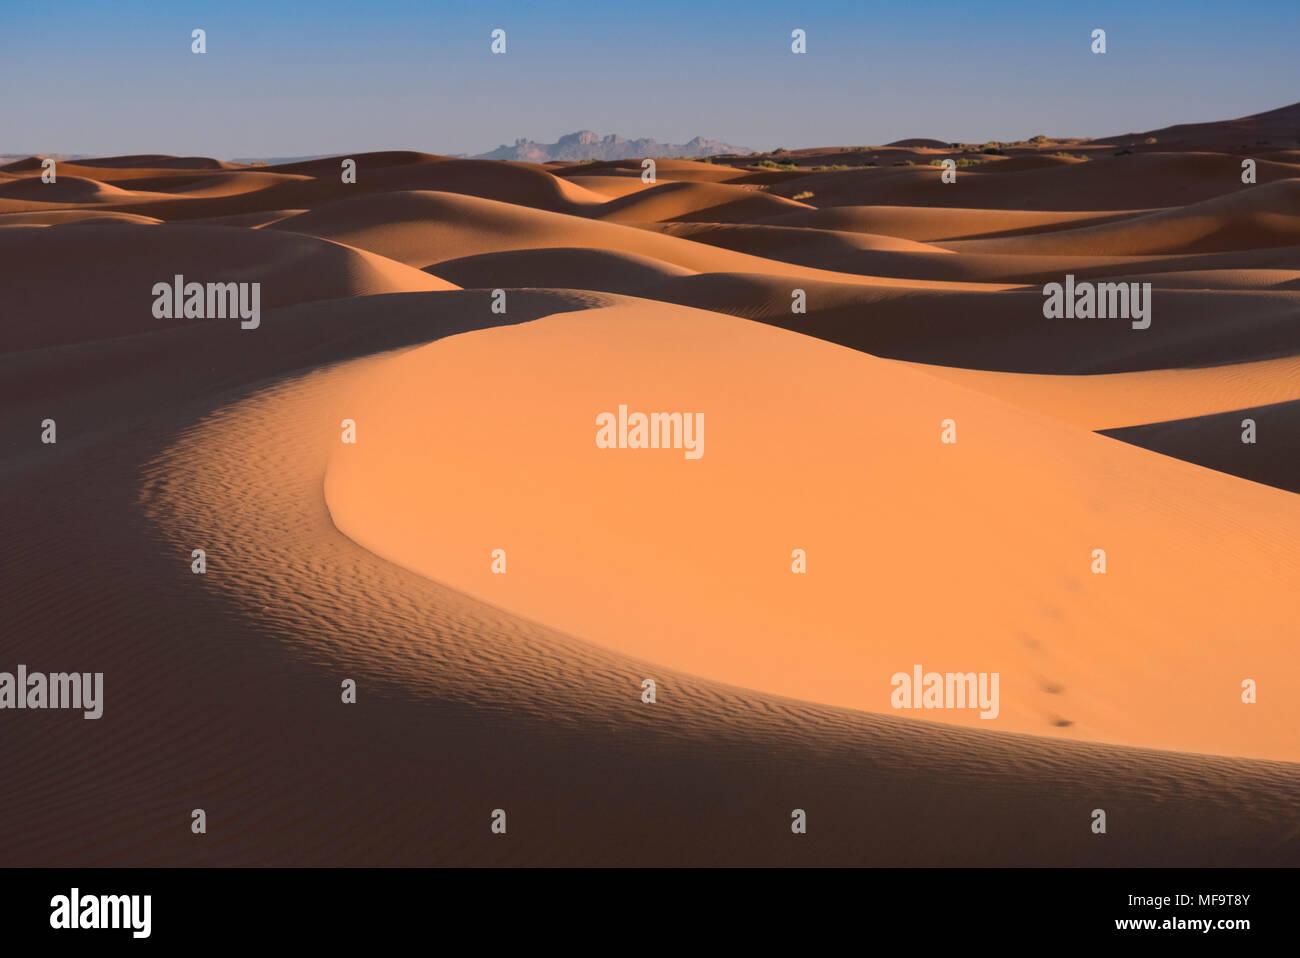 Sea of Sand, Erg Chebbi Desert Dunes, Western Sahara, Morocco - Stock Image